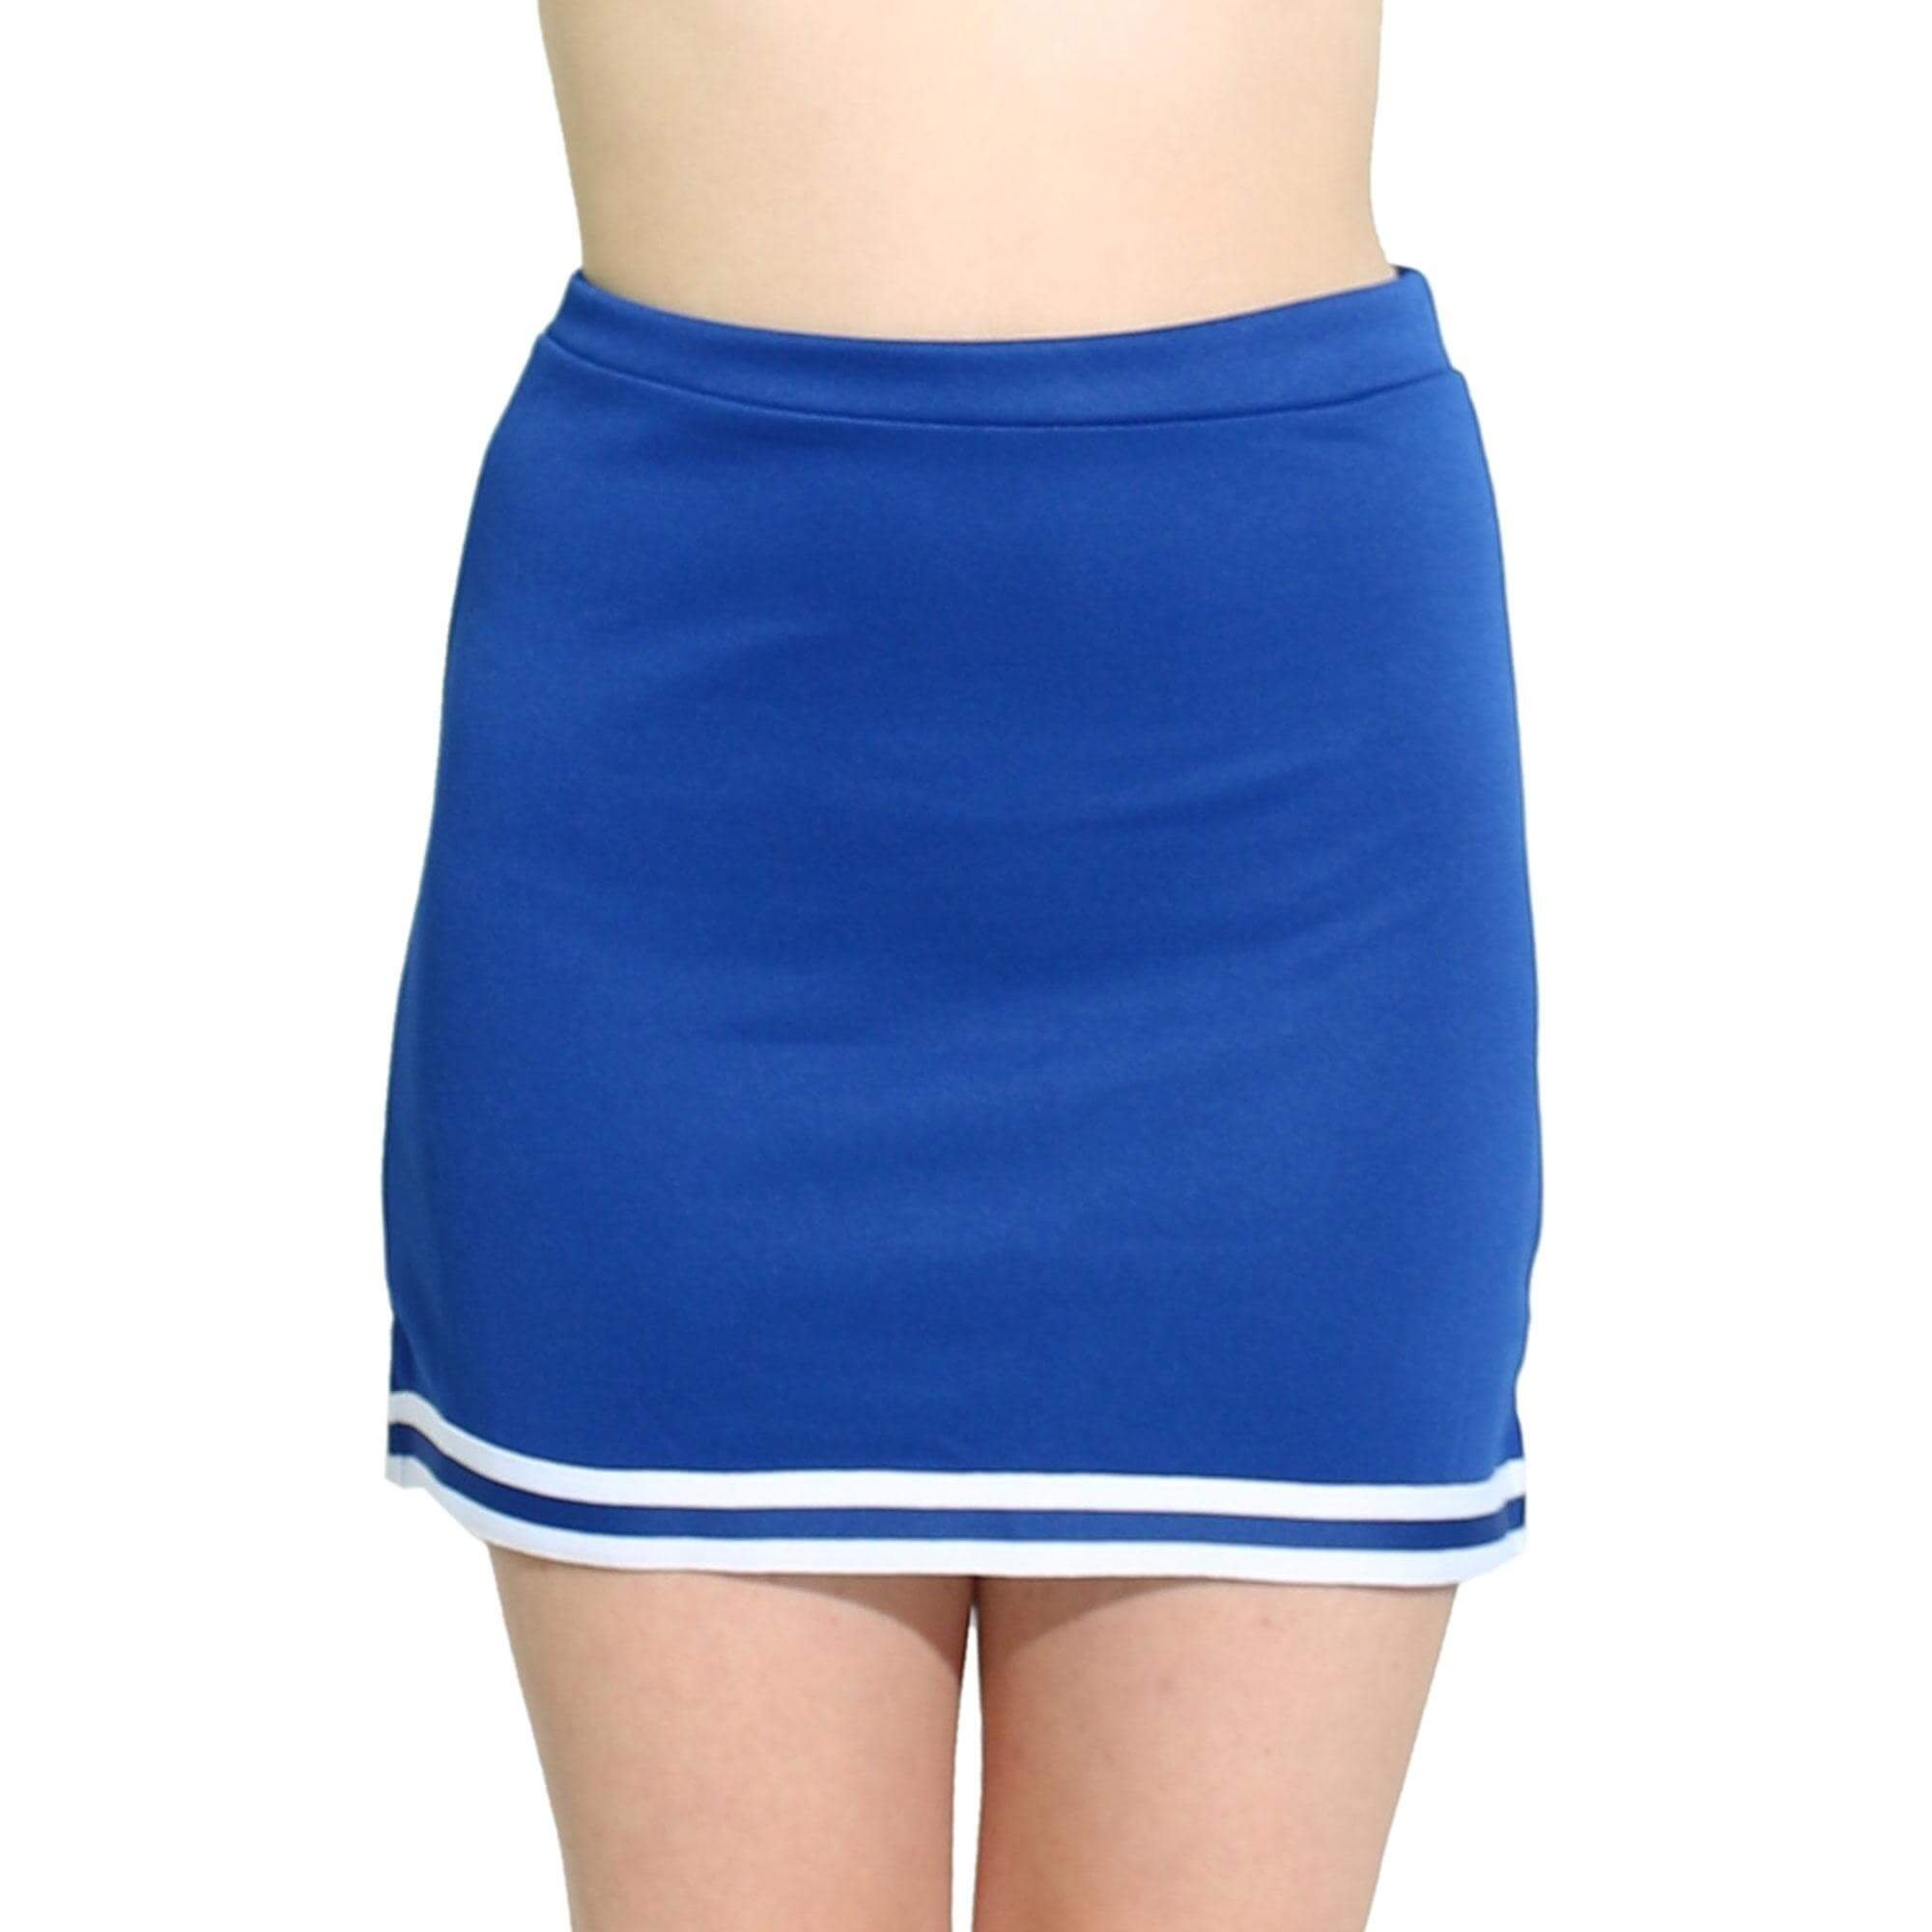 Danzcue Womens A-Line Cheerleaders Uniform Skirt